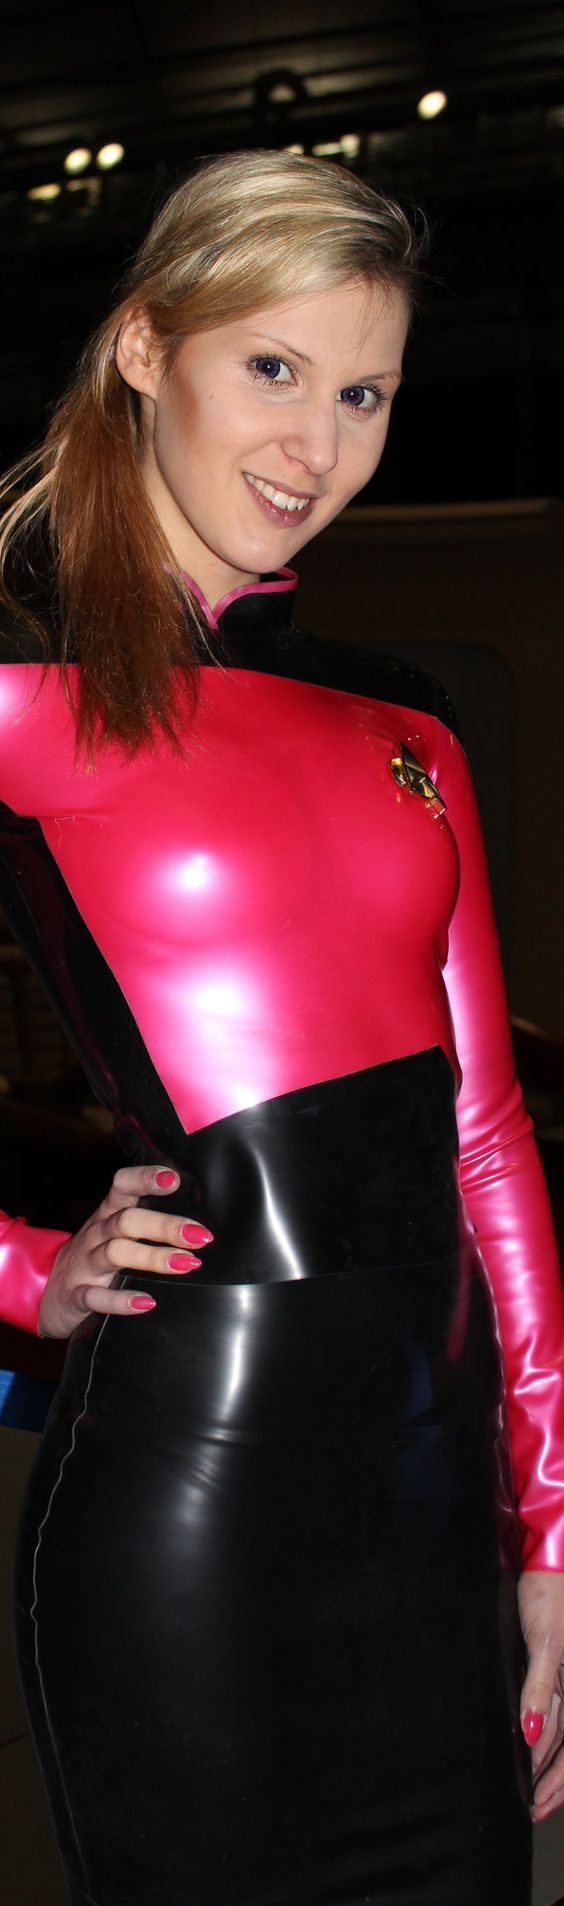 Black and red latex Star Trek costume